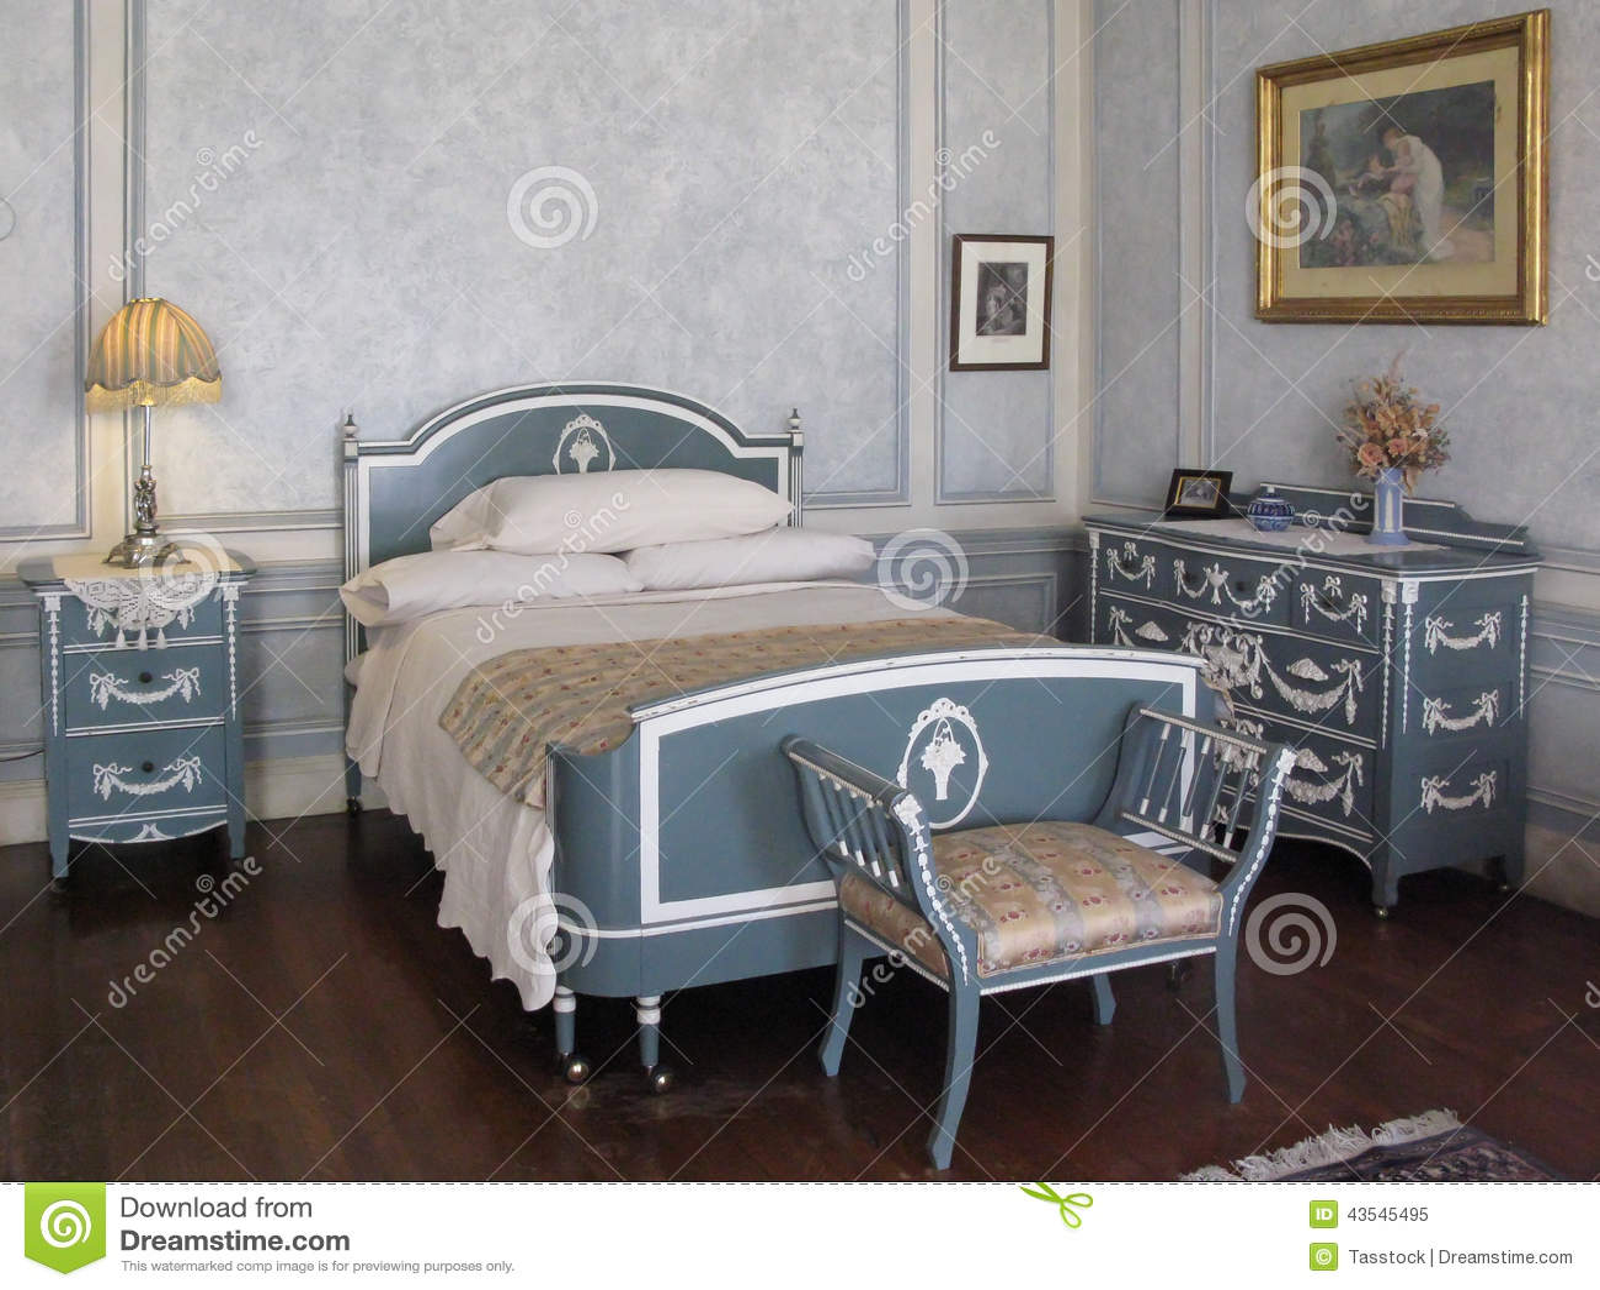 Lady Bedroom Bedroom Lady Pellat In Casa Loma Toronto Editorial Image Image